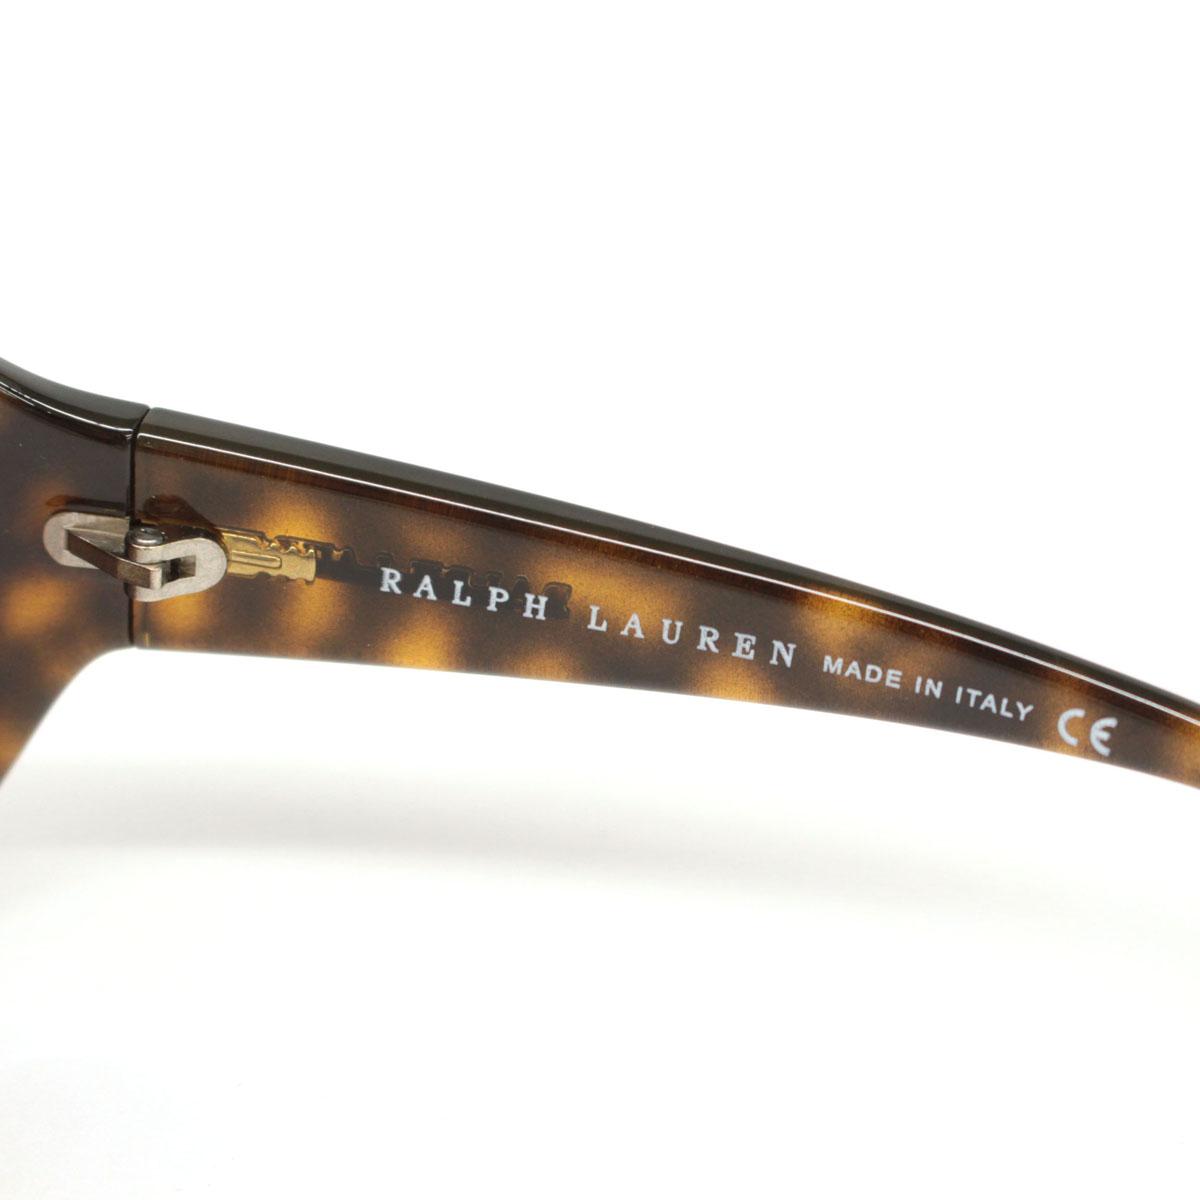 RALPH LAUREN ラルフローレン サングラス ケース・箱付き RL8009 5057 13 62□18 115brown茶 ブラウン メンズ レディースeE9YbWH2DI